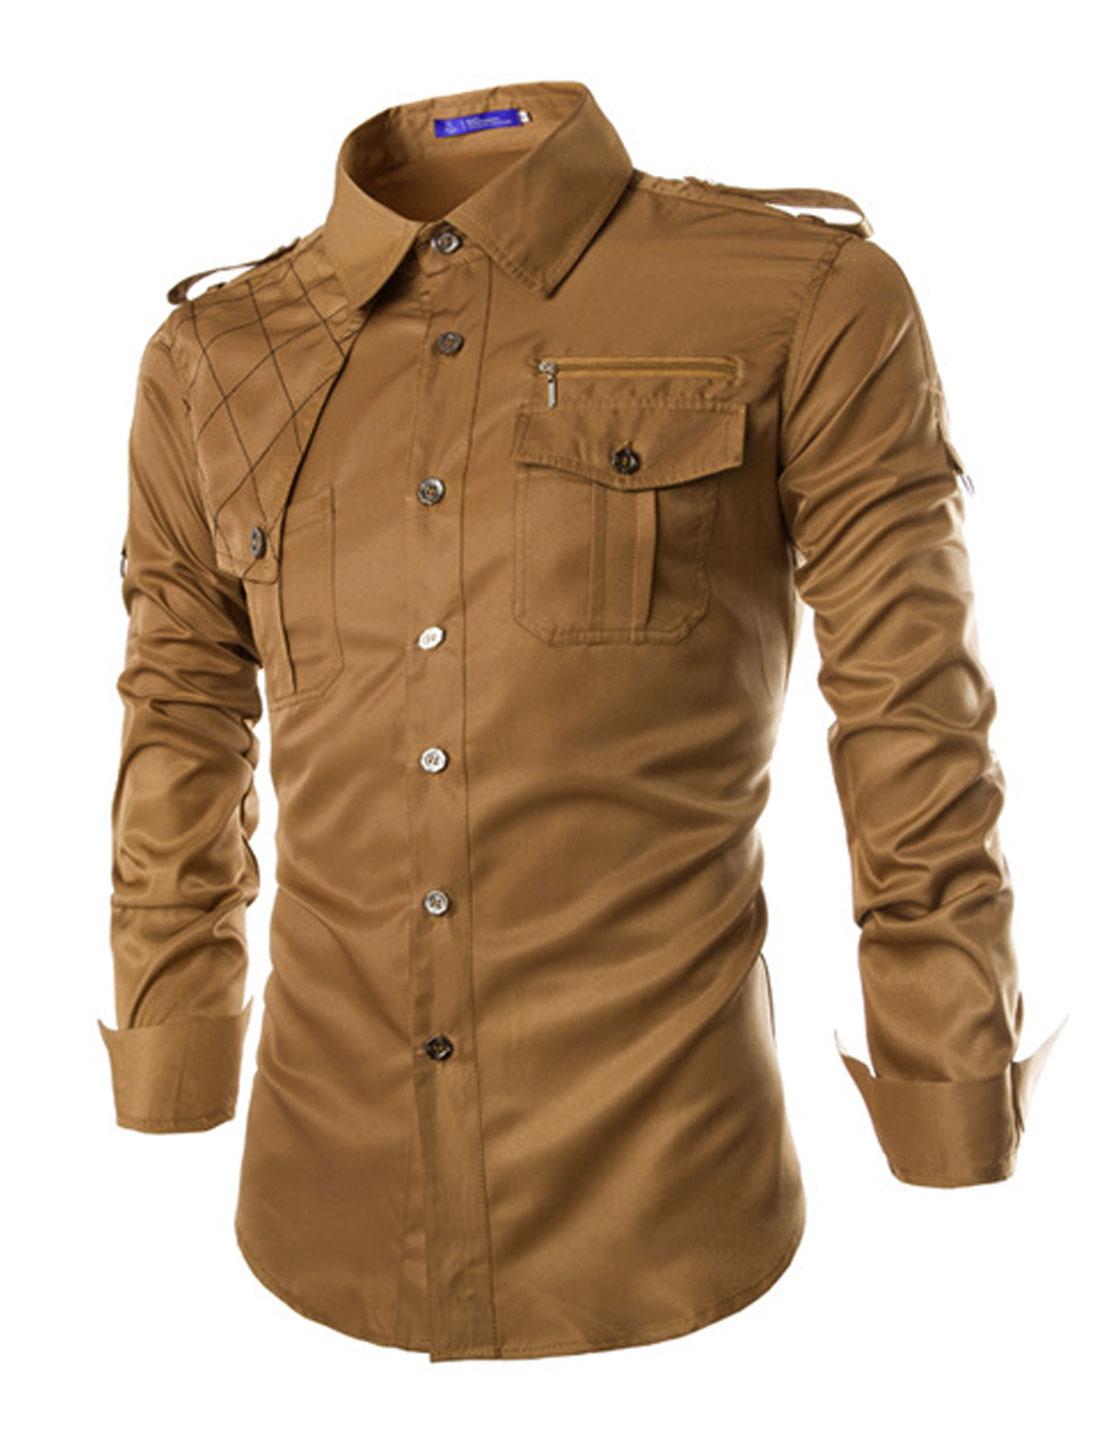 Men Long Sleeves Epaulets Round Hem Casual Shirts Camel M